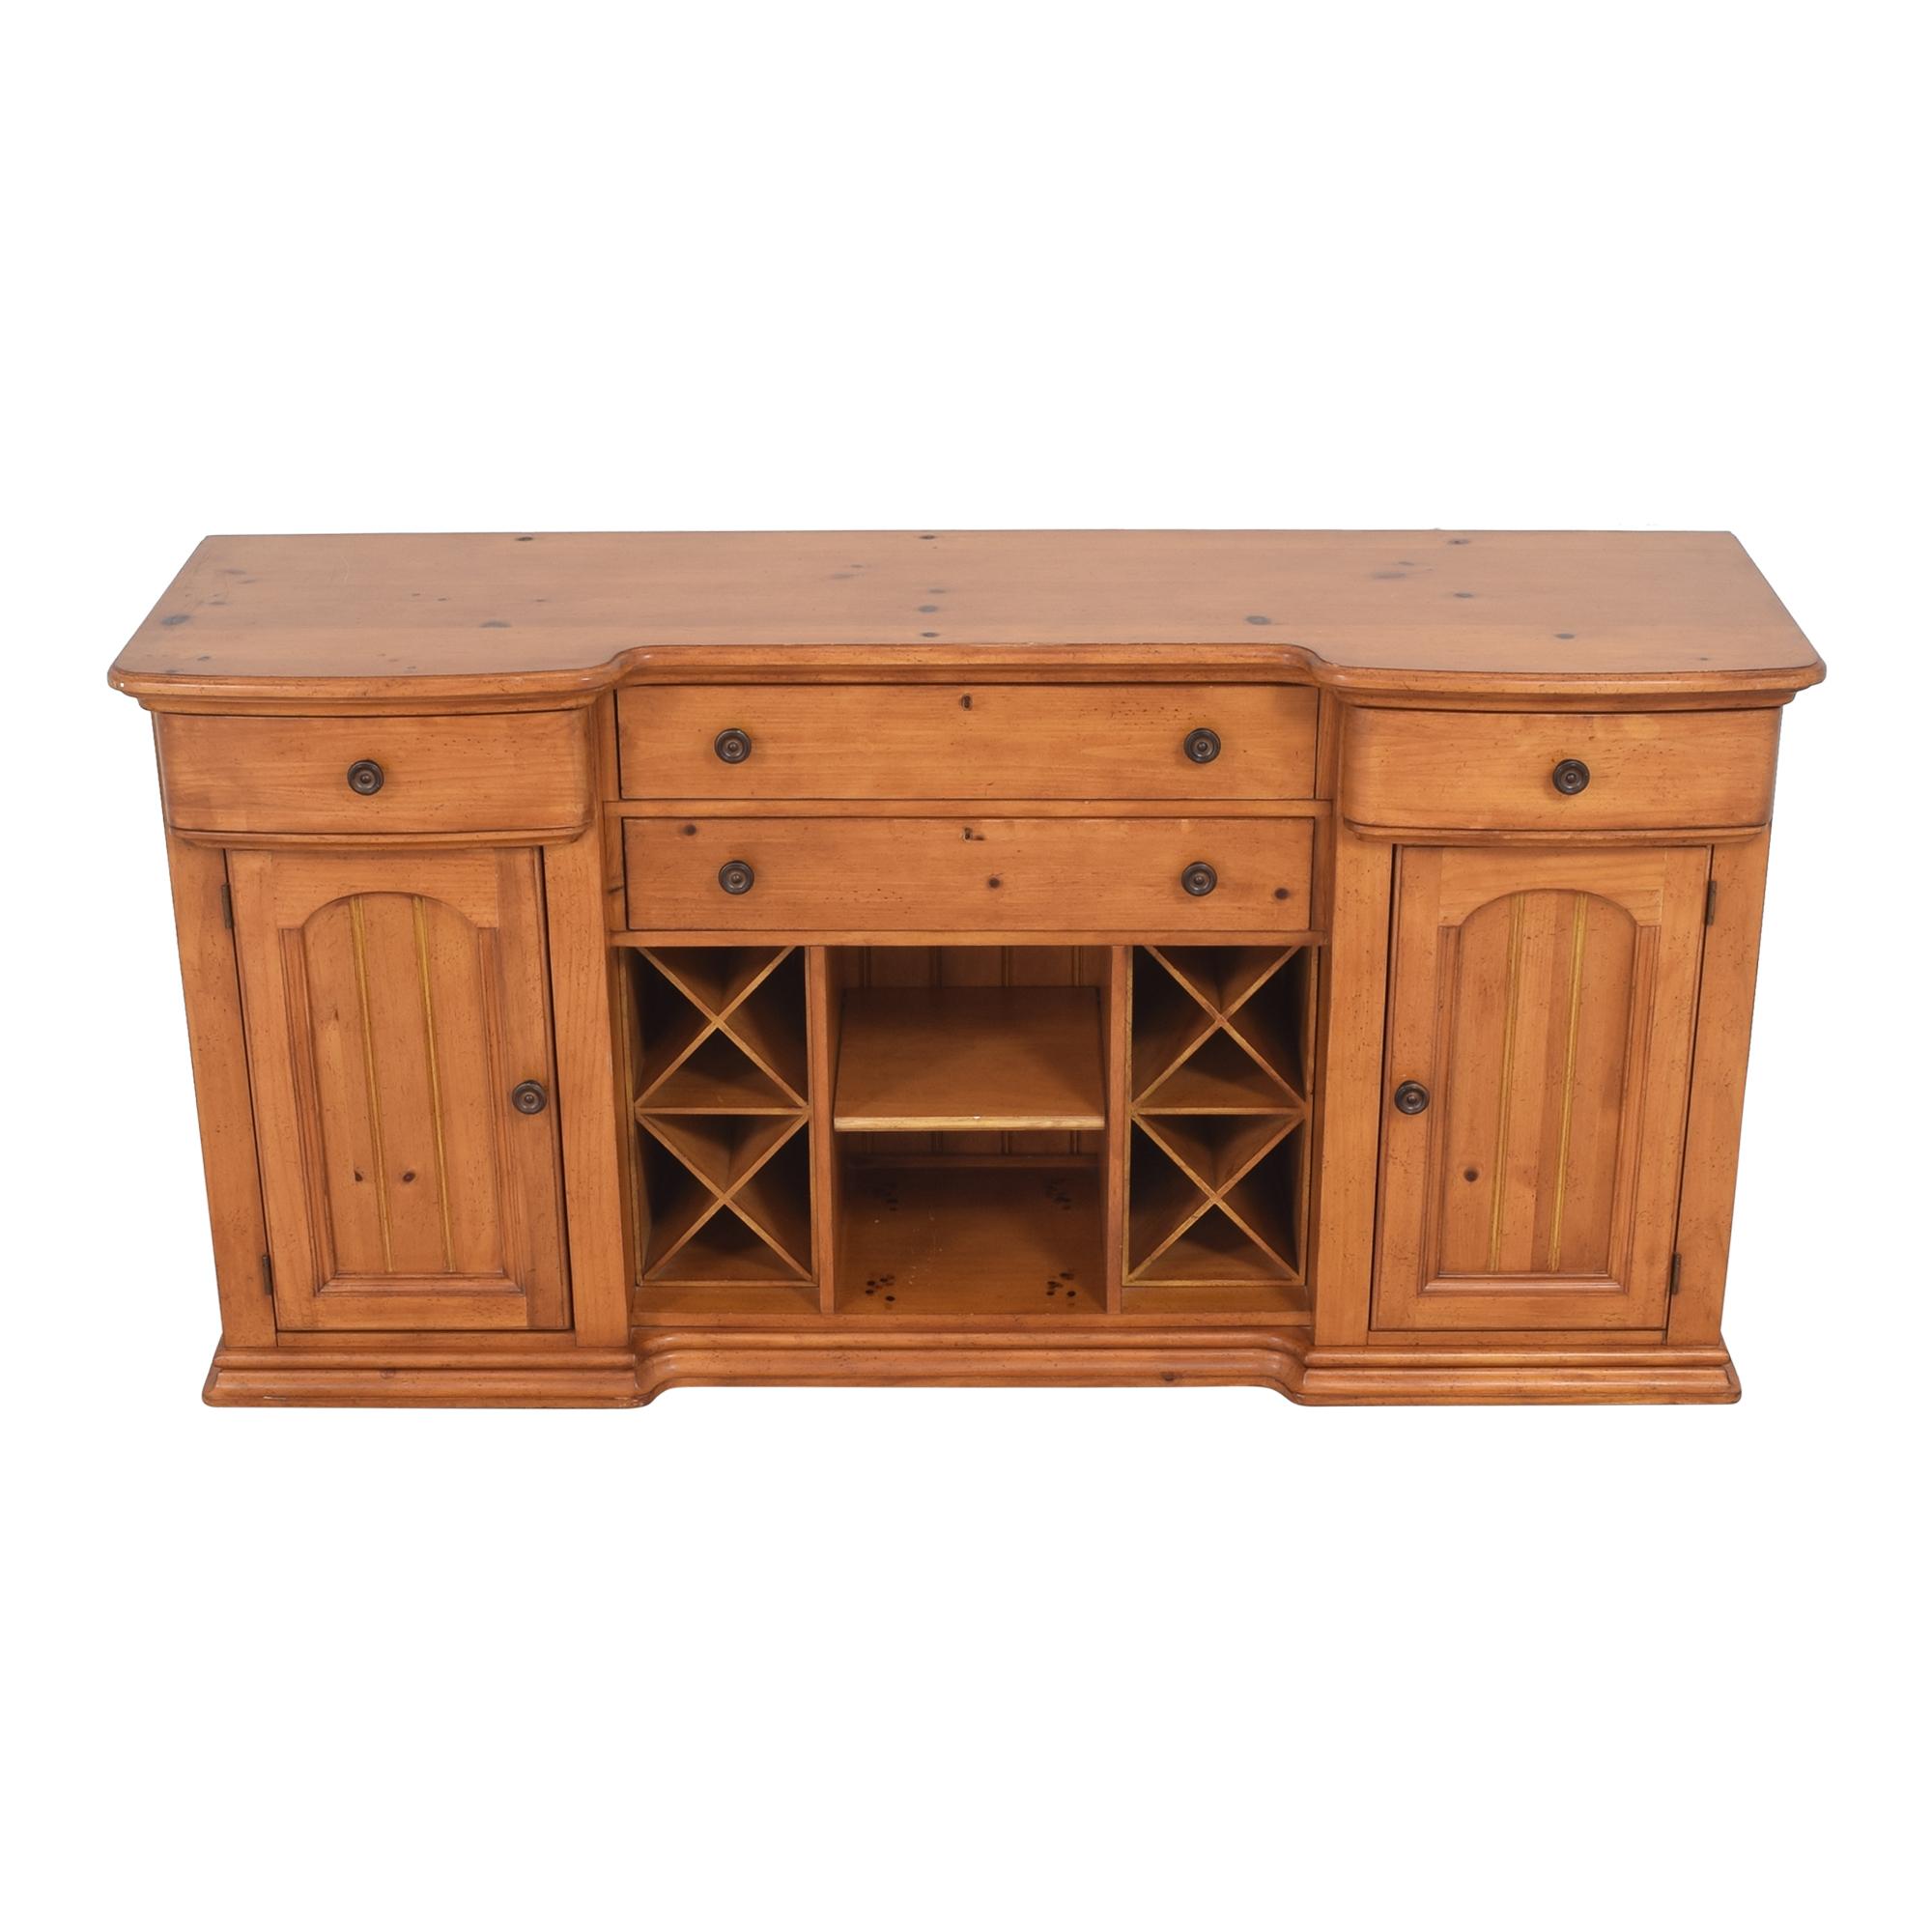 Stanley Furniture Stanley Furniture Cottage Revival Vineyard Service Cabinet pa